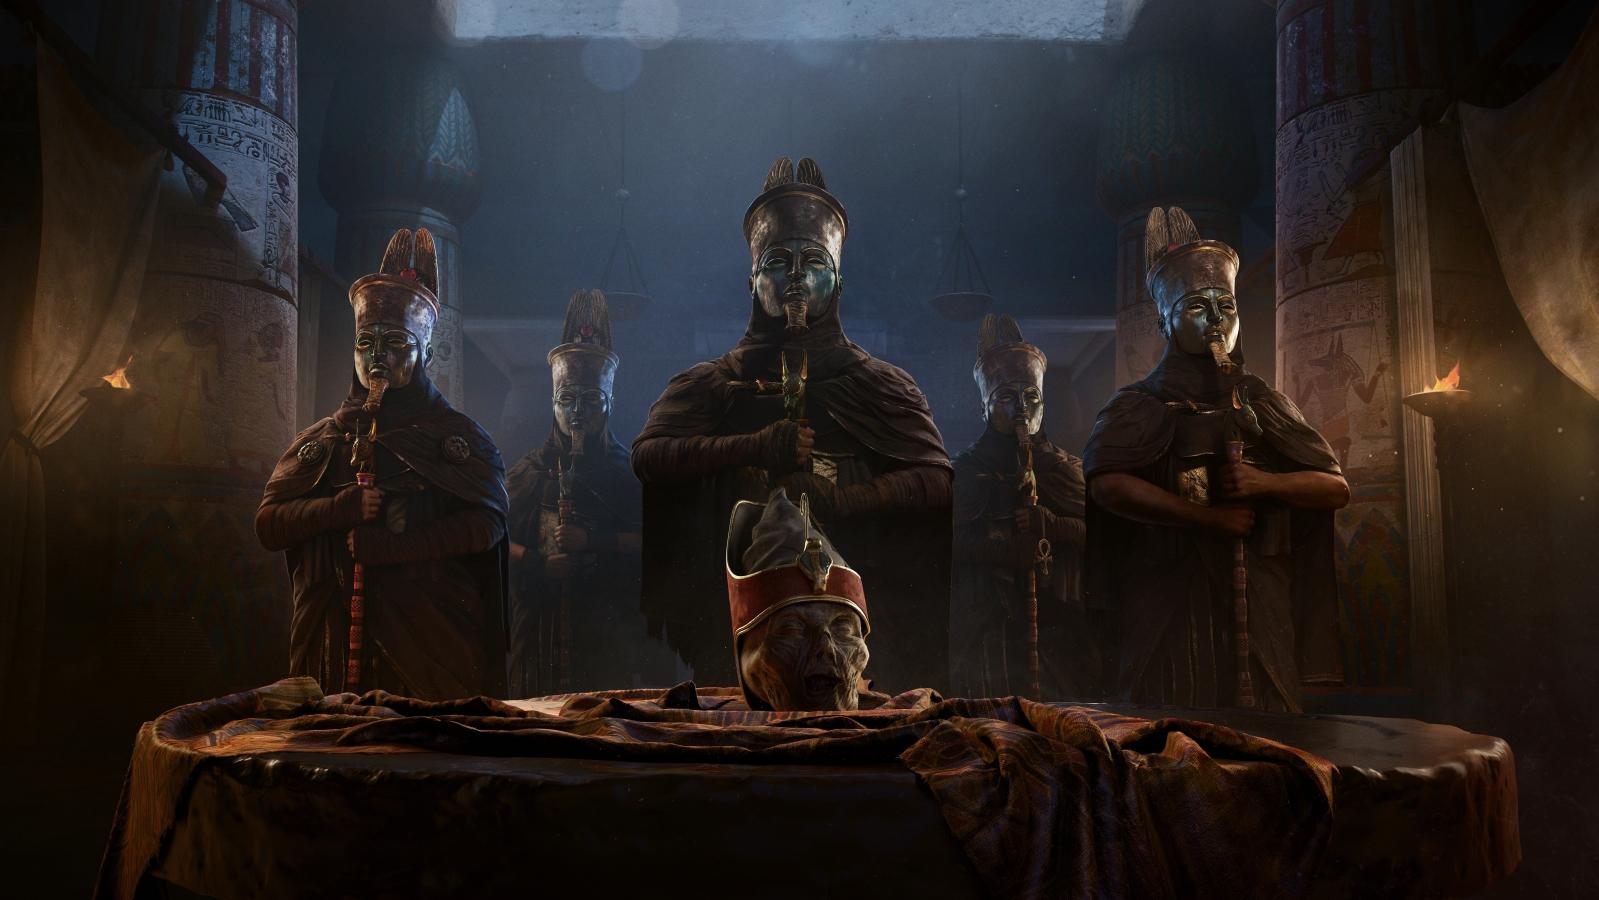 assassin 039 S creed origins 11736x6602 assassins creed origins order Of The ancients 4k 8k 10082